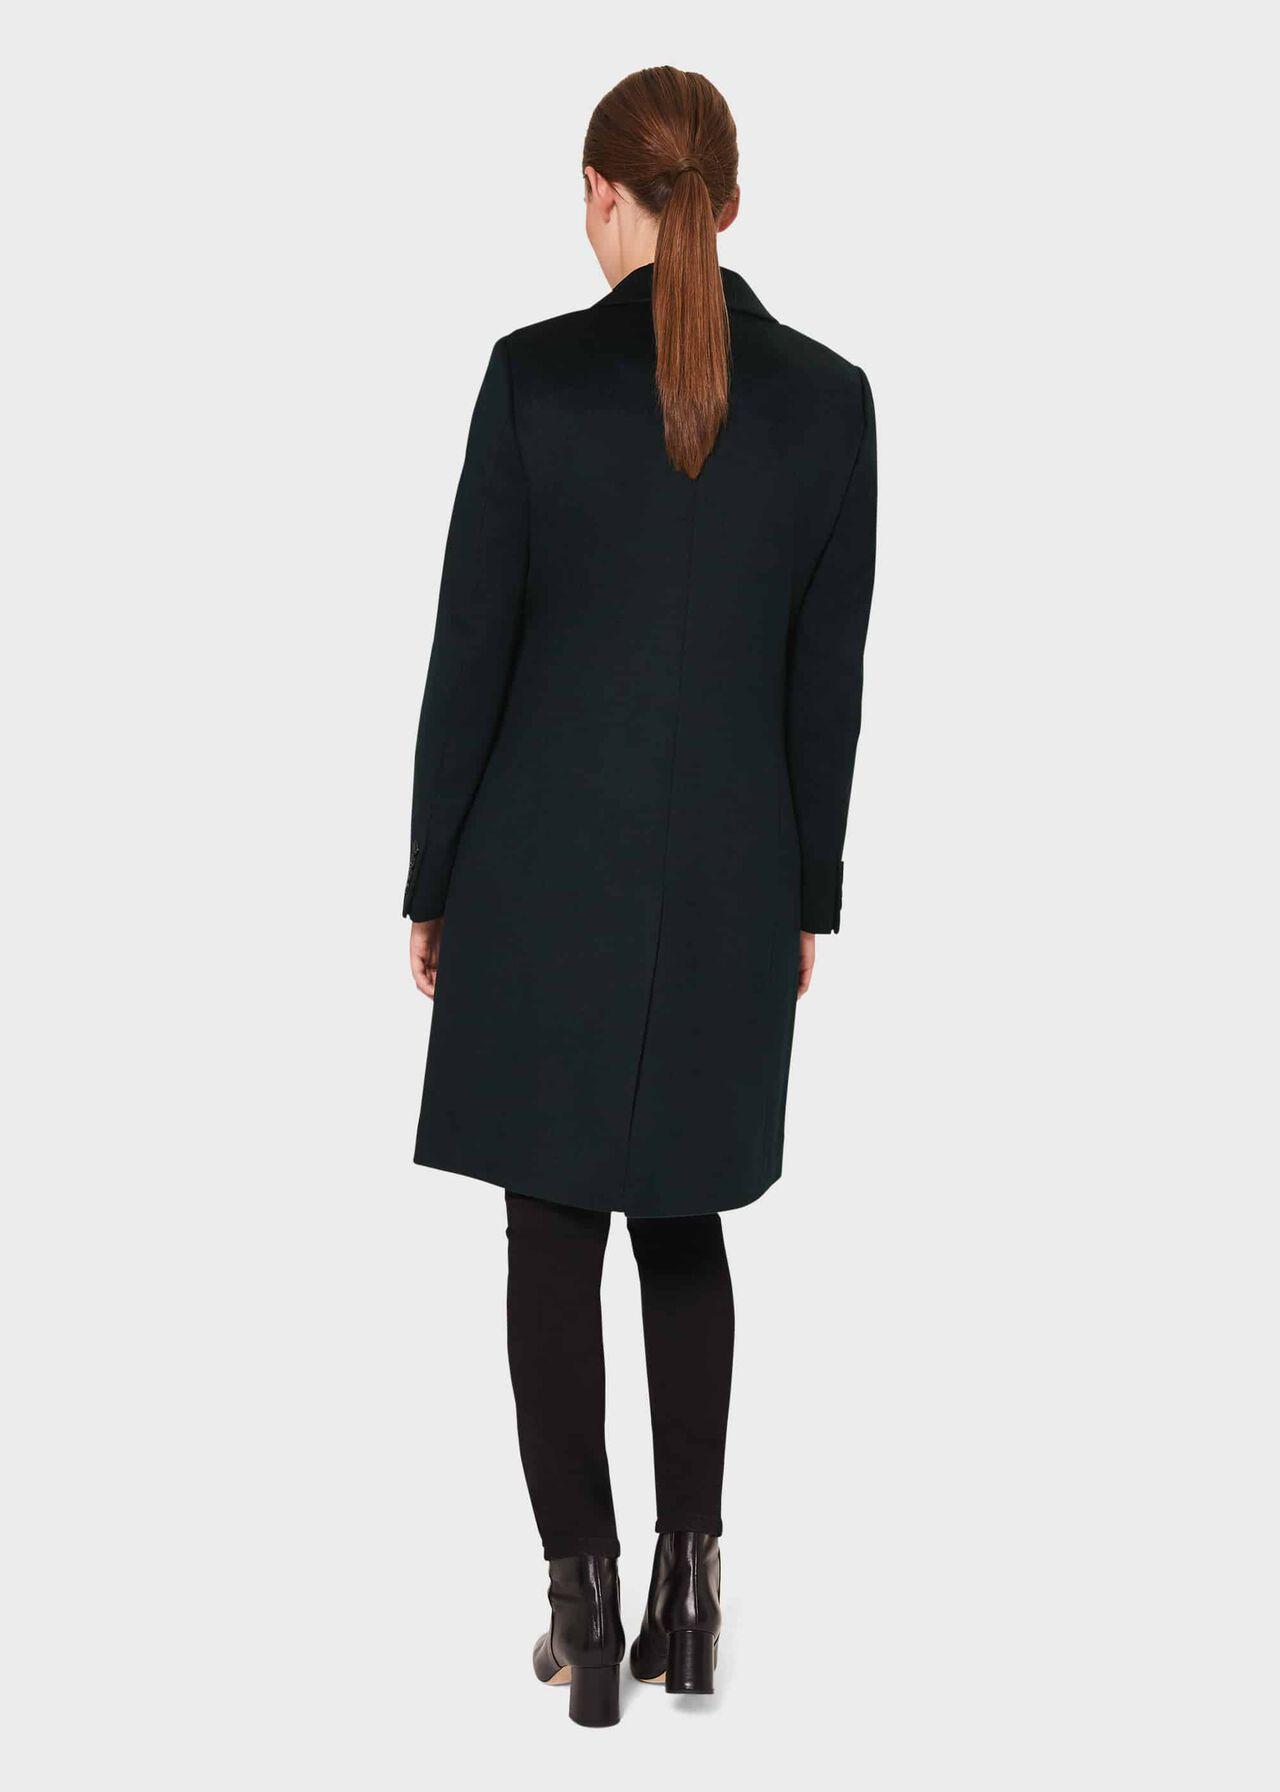 Petite Tilda Wool Collar Coat, Fern Green, hi-res